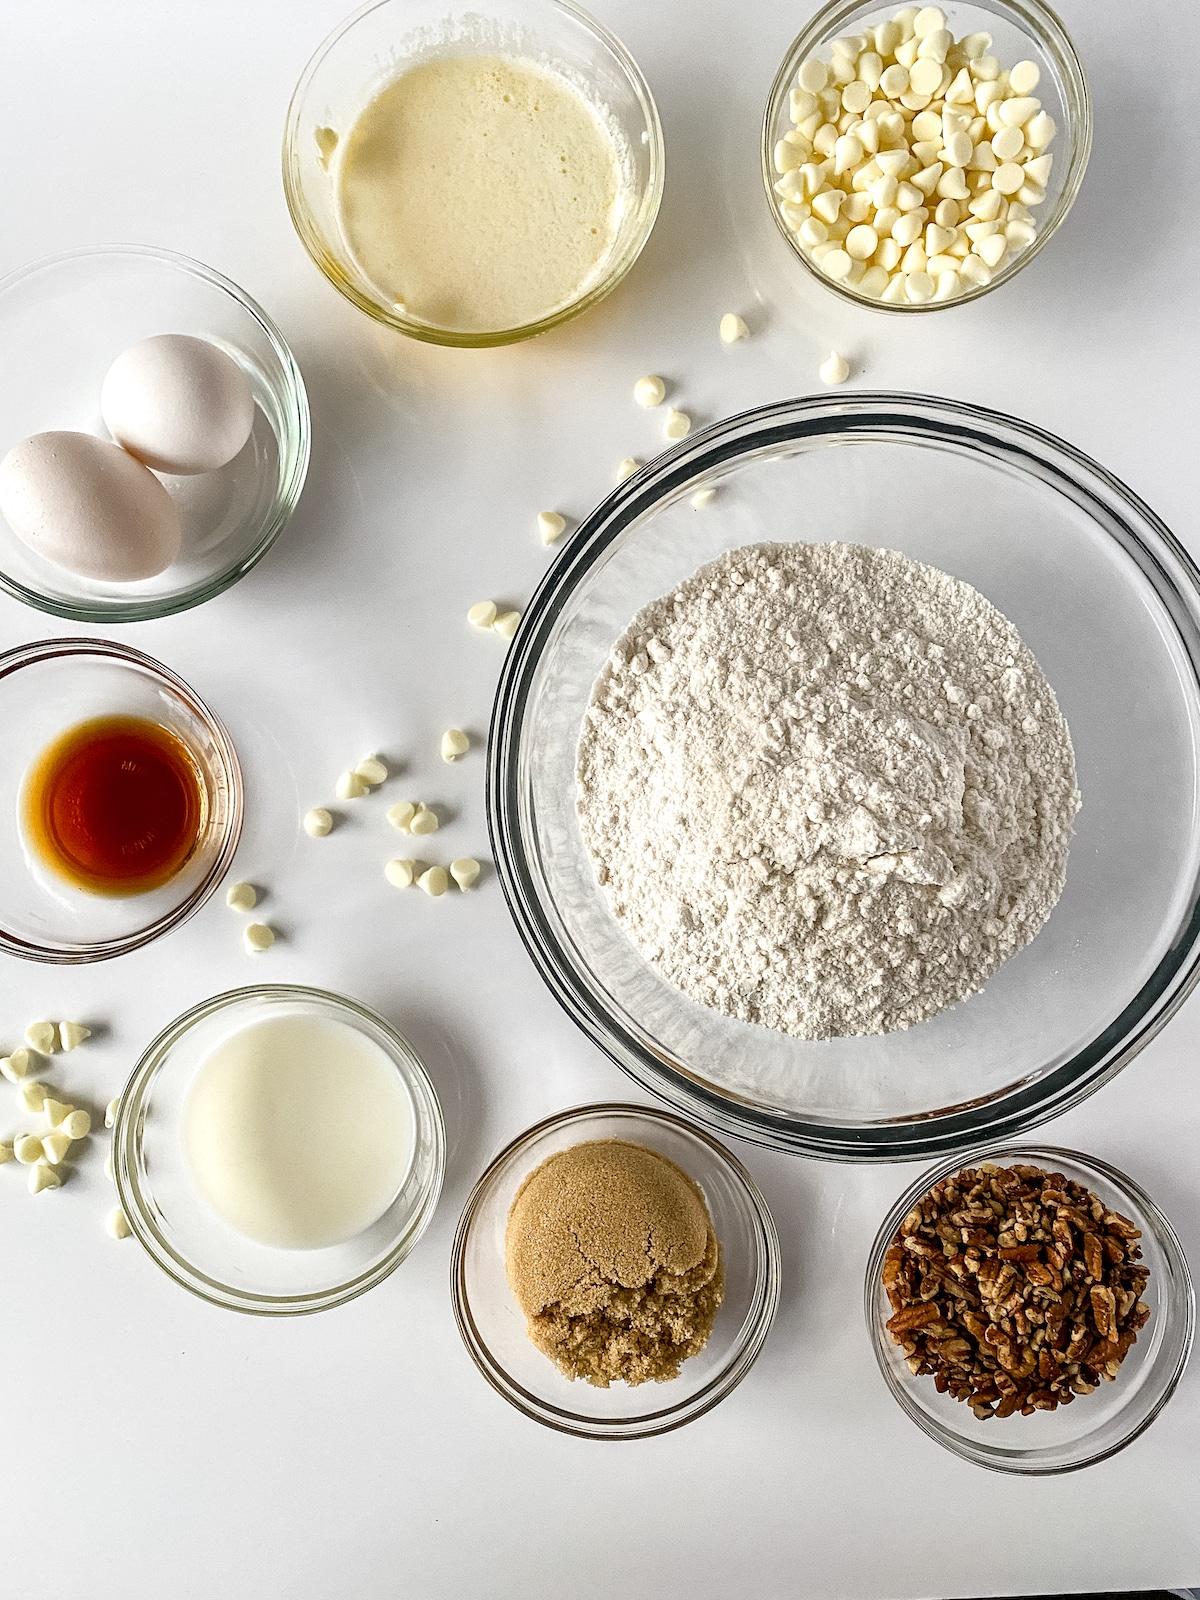 Ingredients for white chocolate blondies